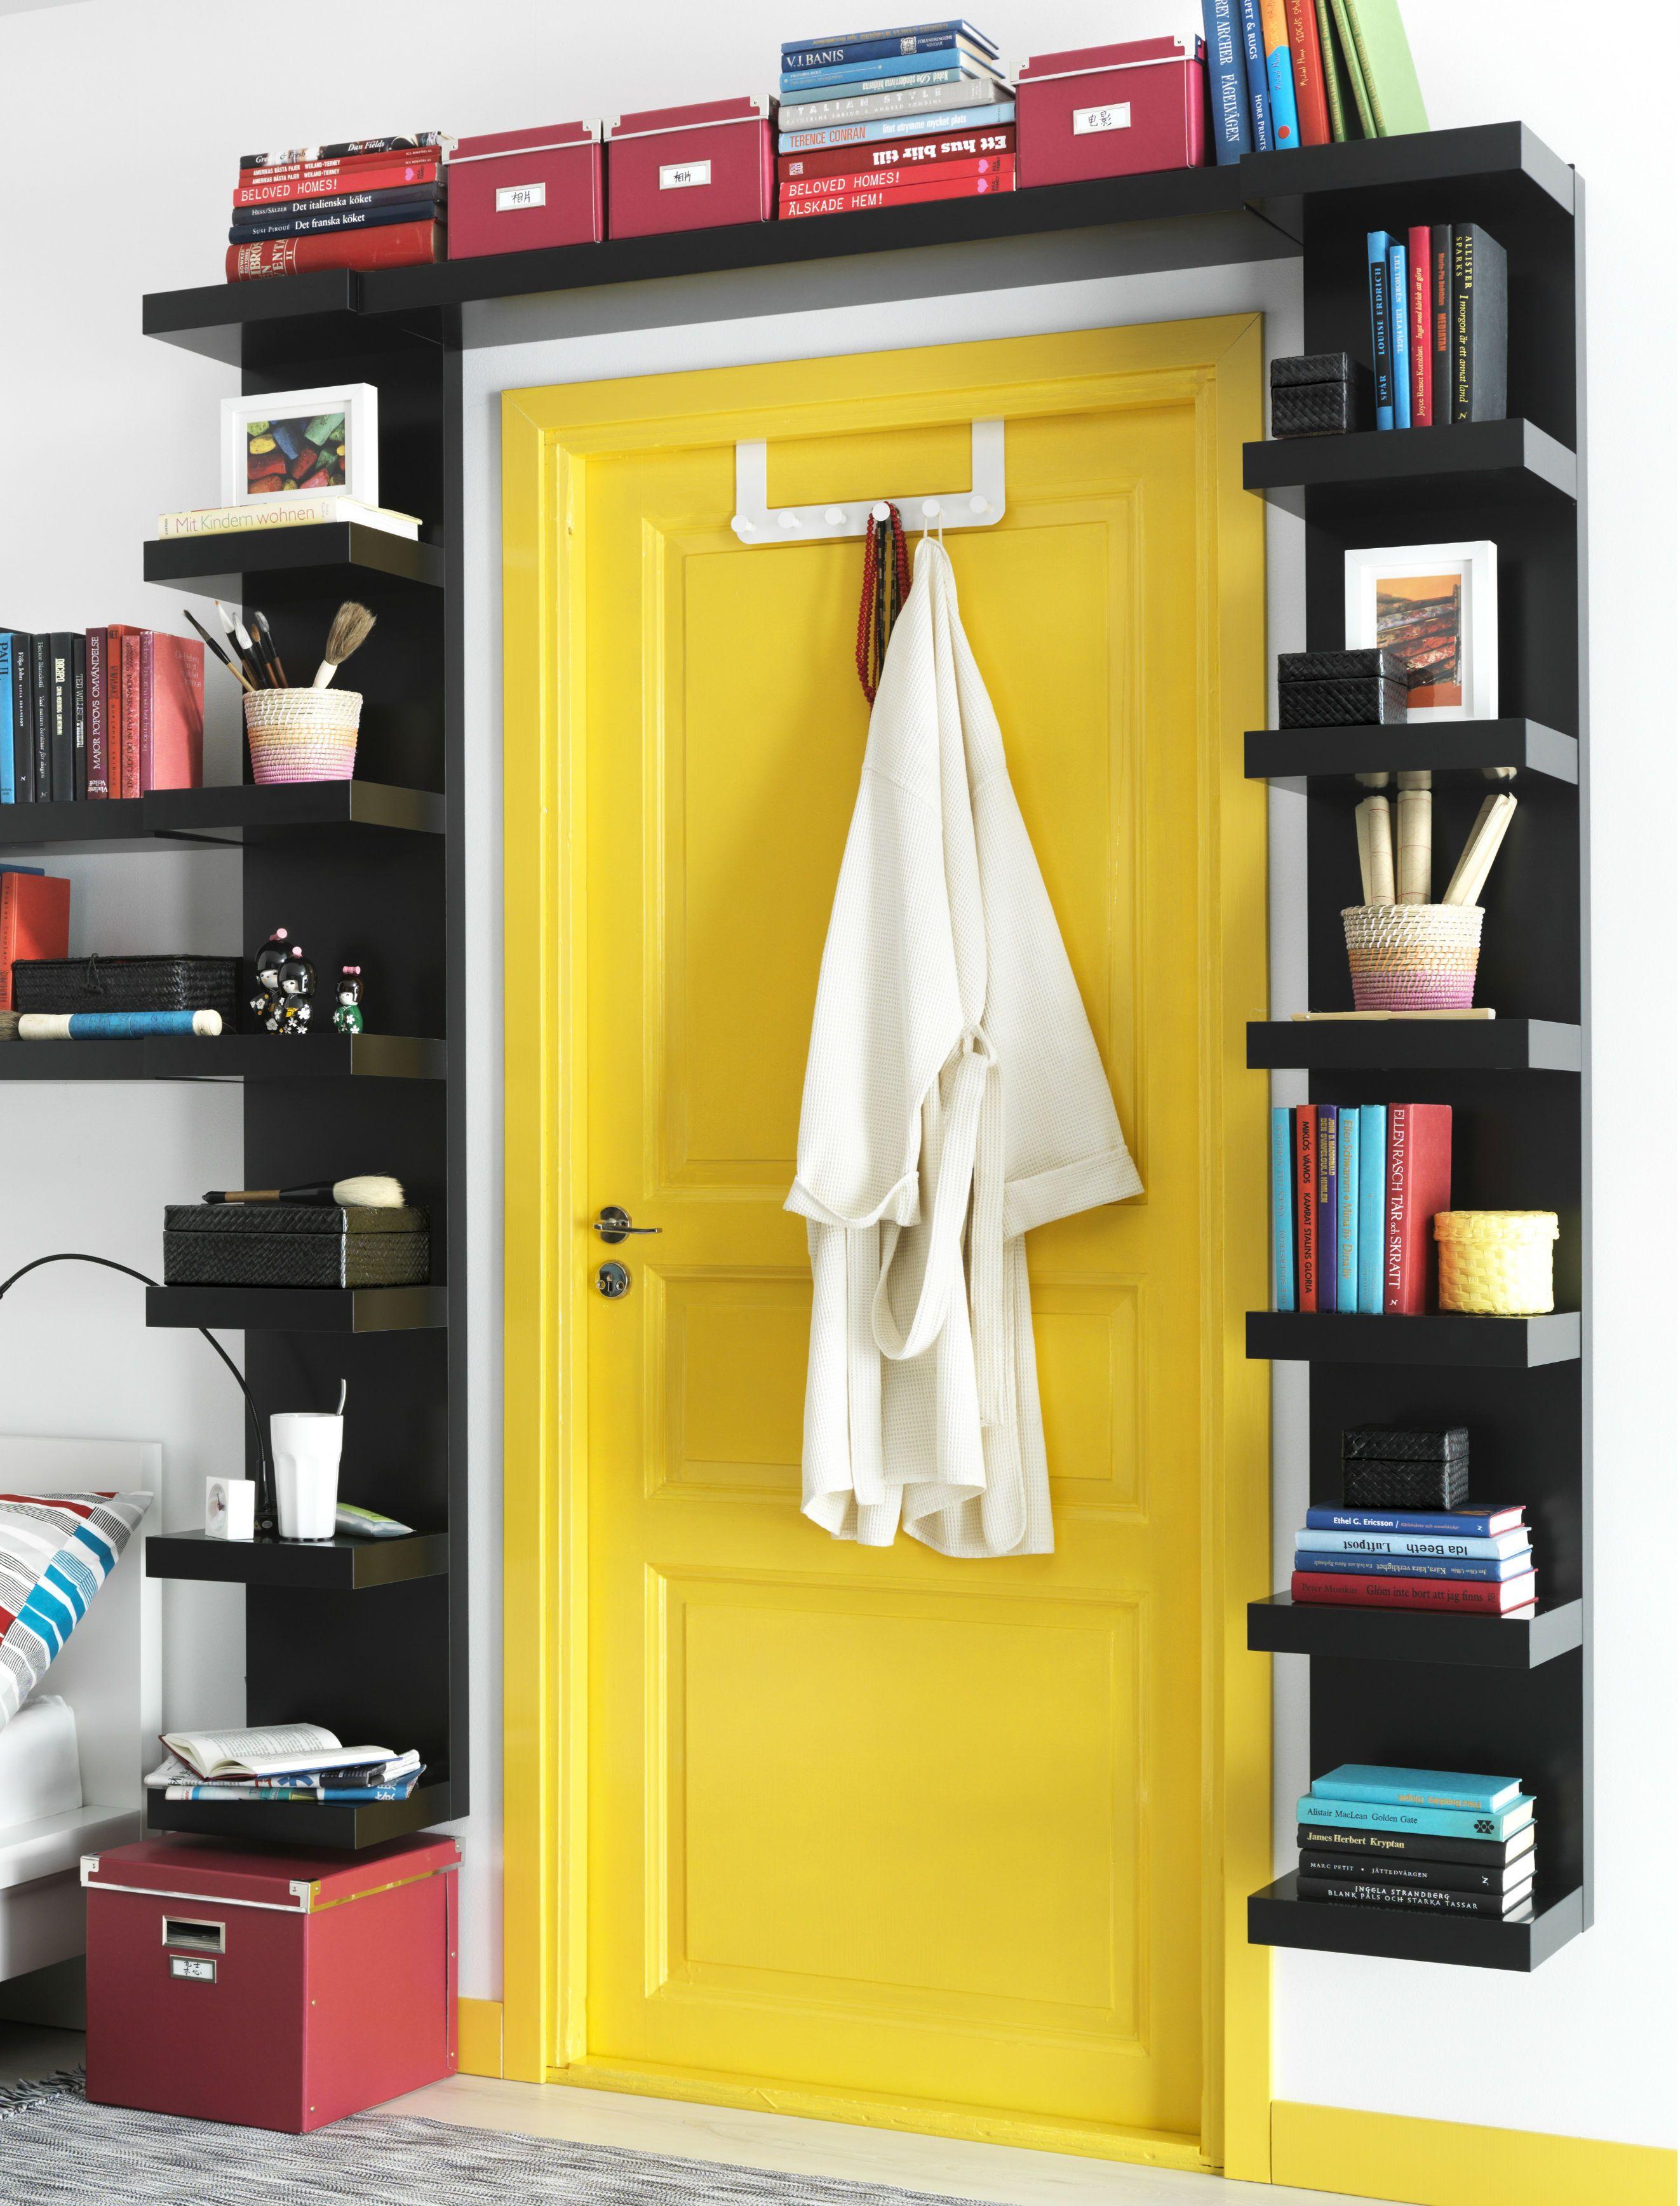 LACK Wall shelf unit, black | Lack shelf, Small spaces and College ...